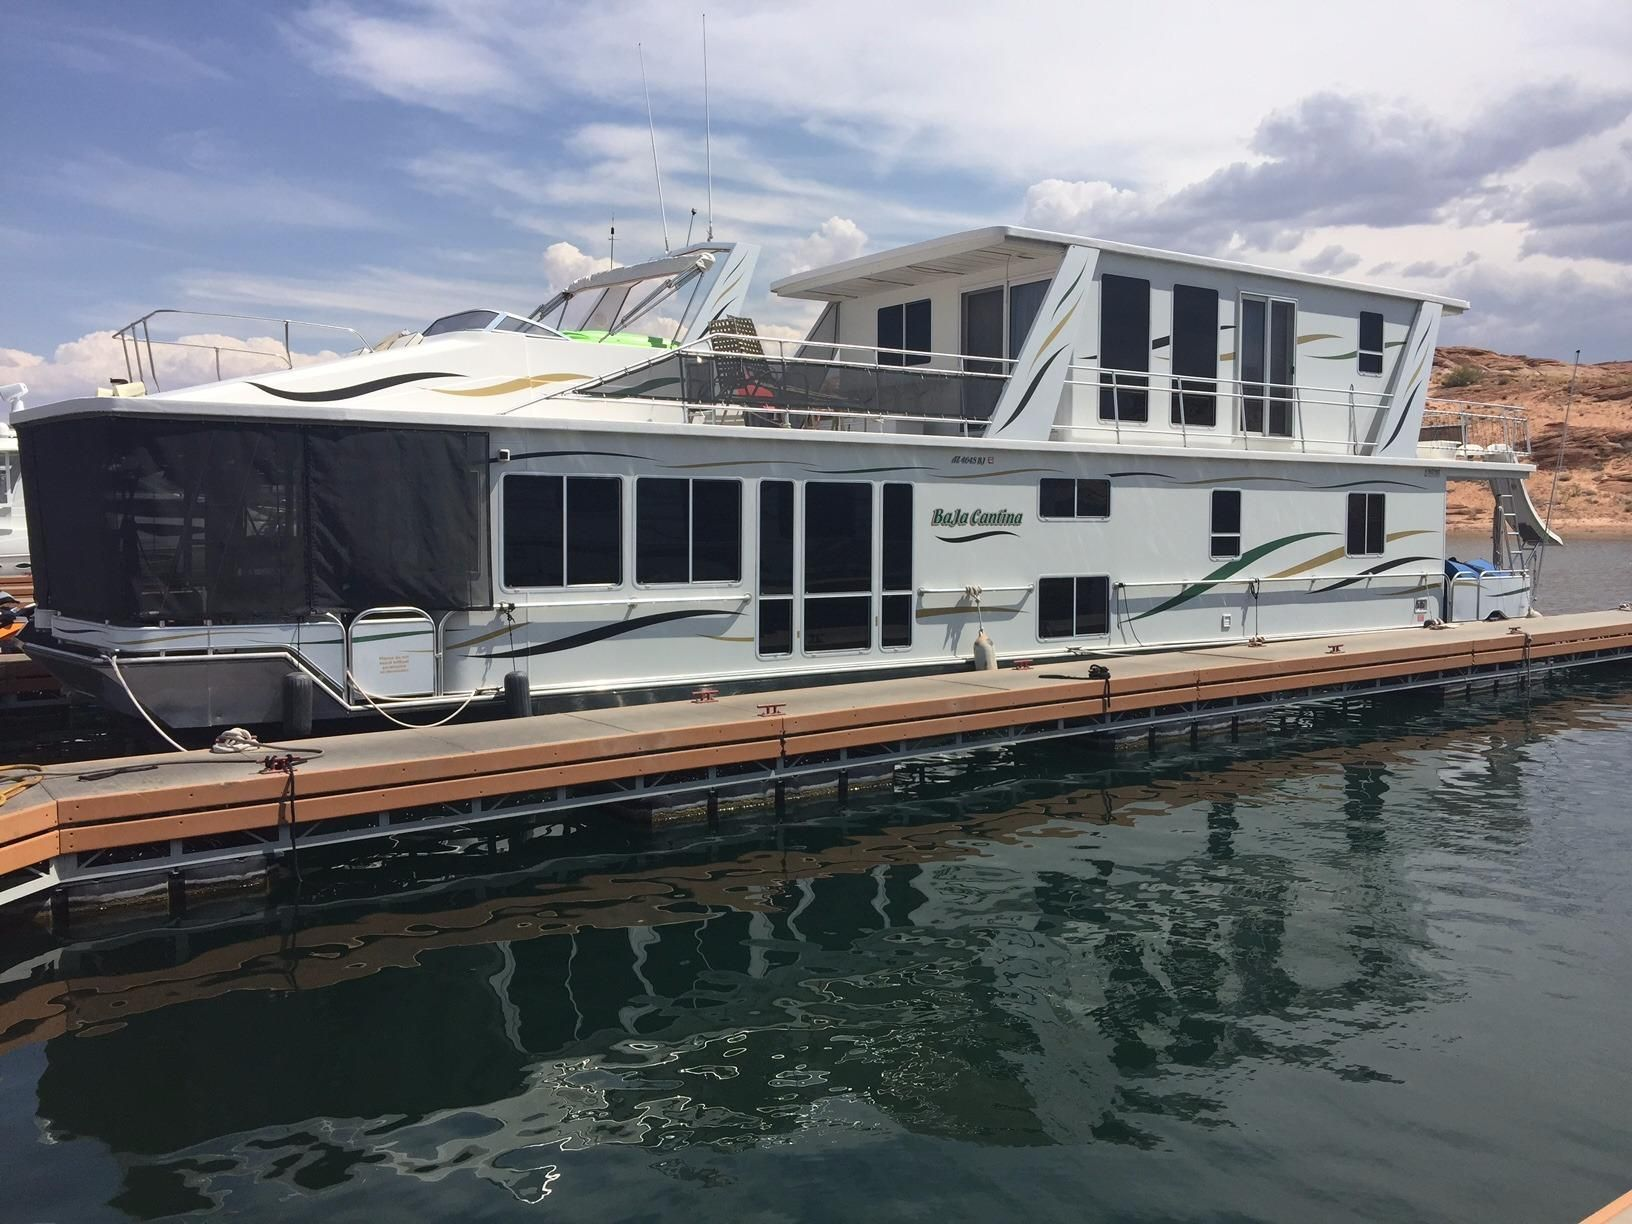 2003 Fantasy Houseboat Baja Cantina